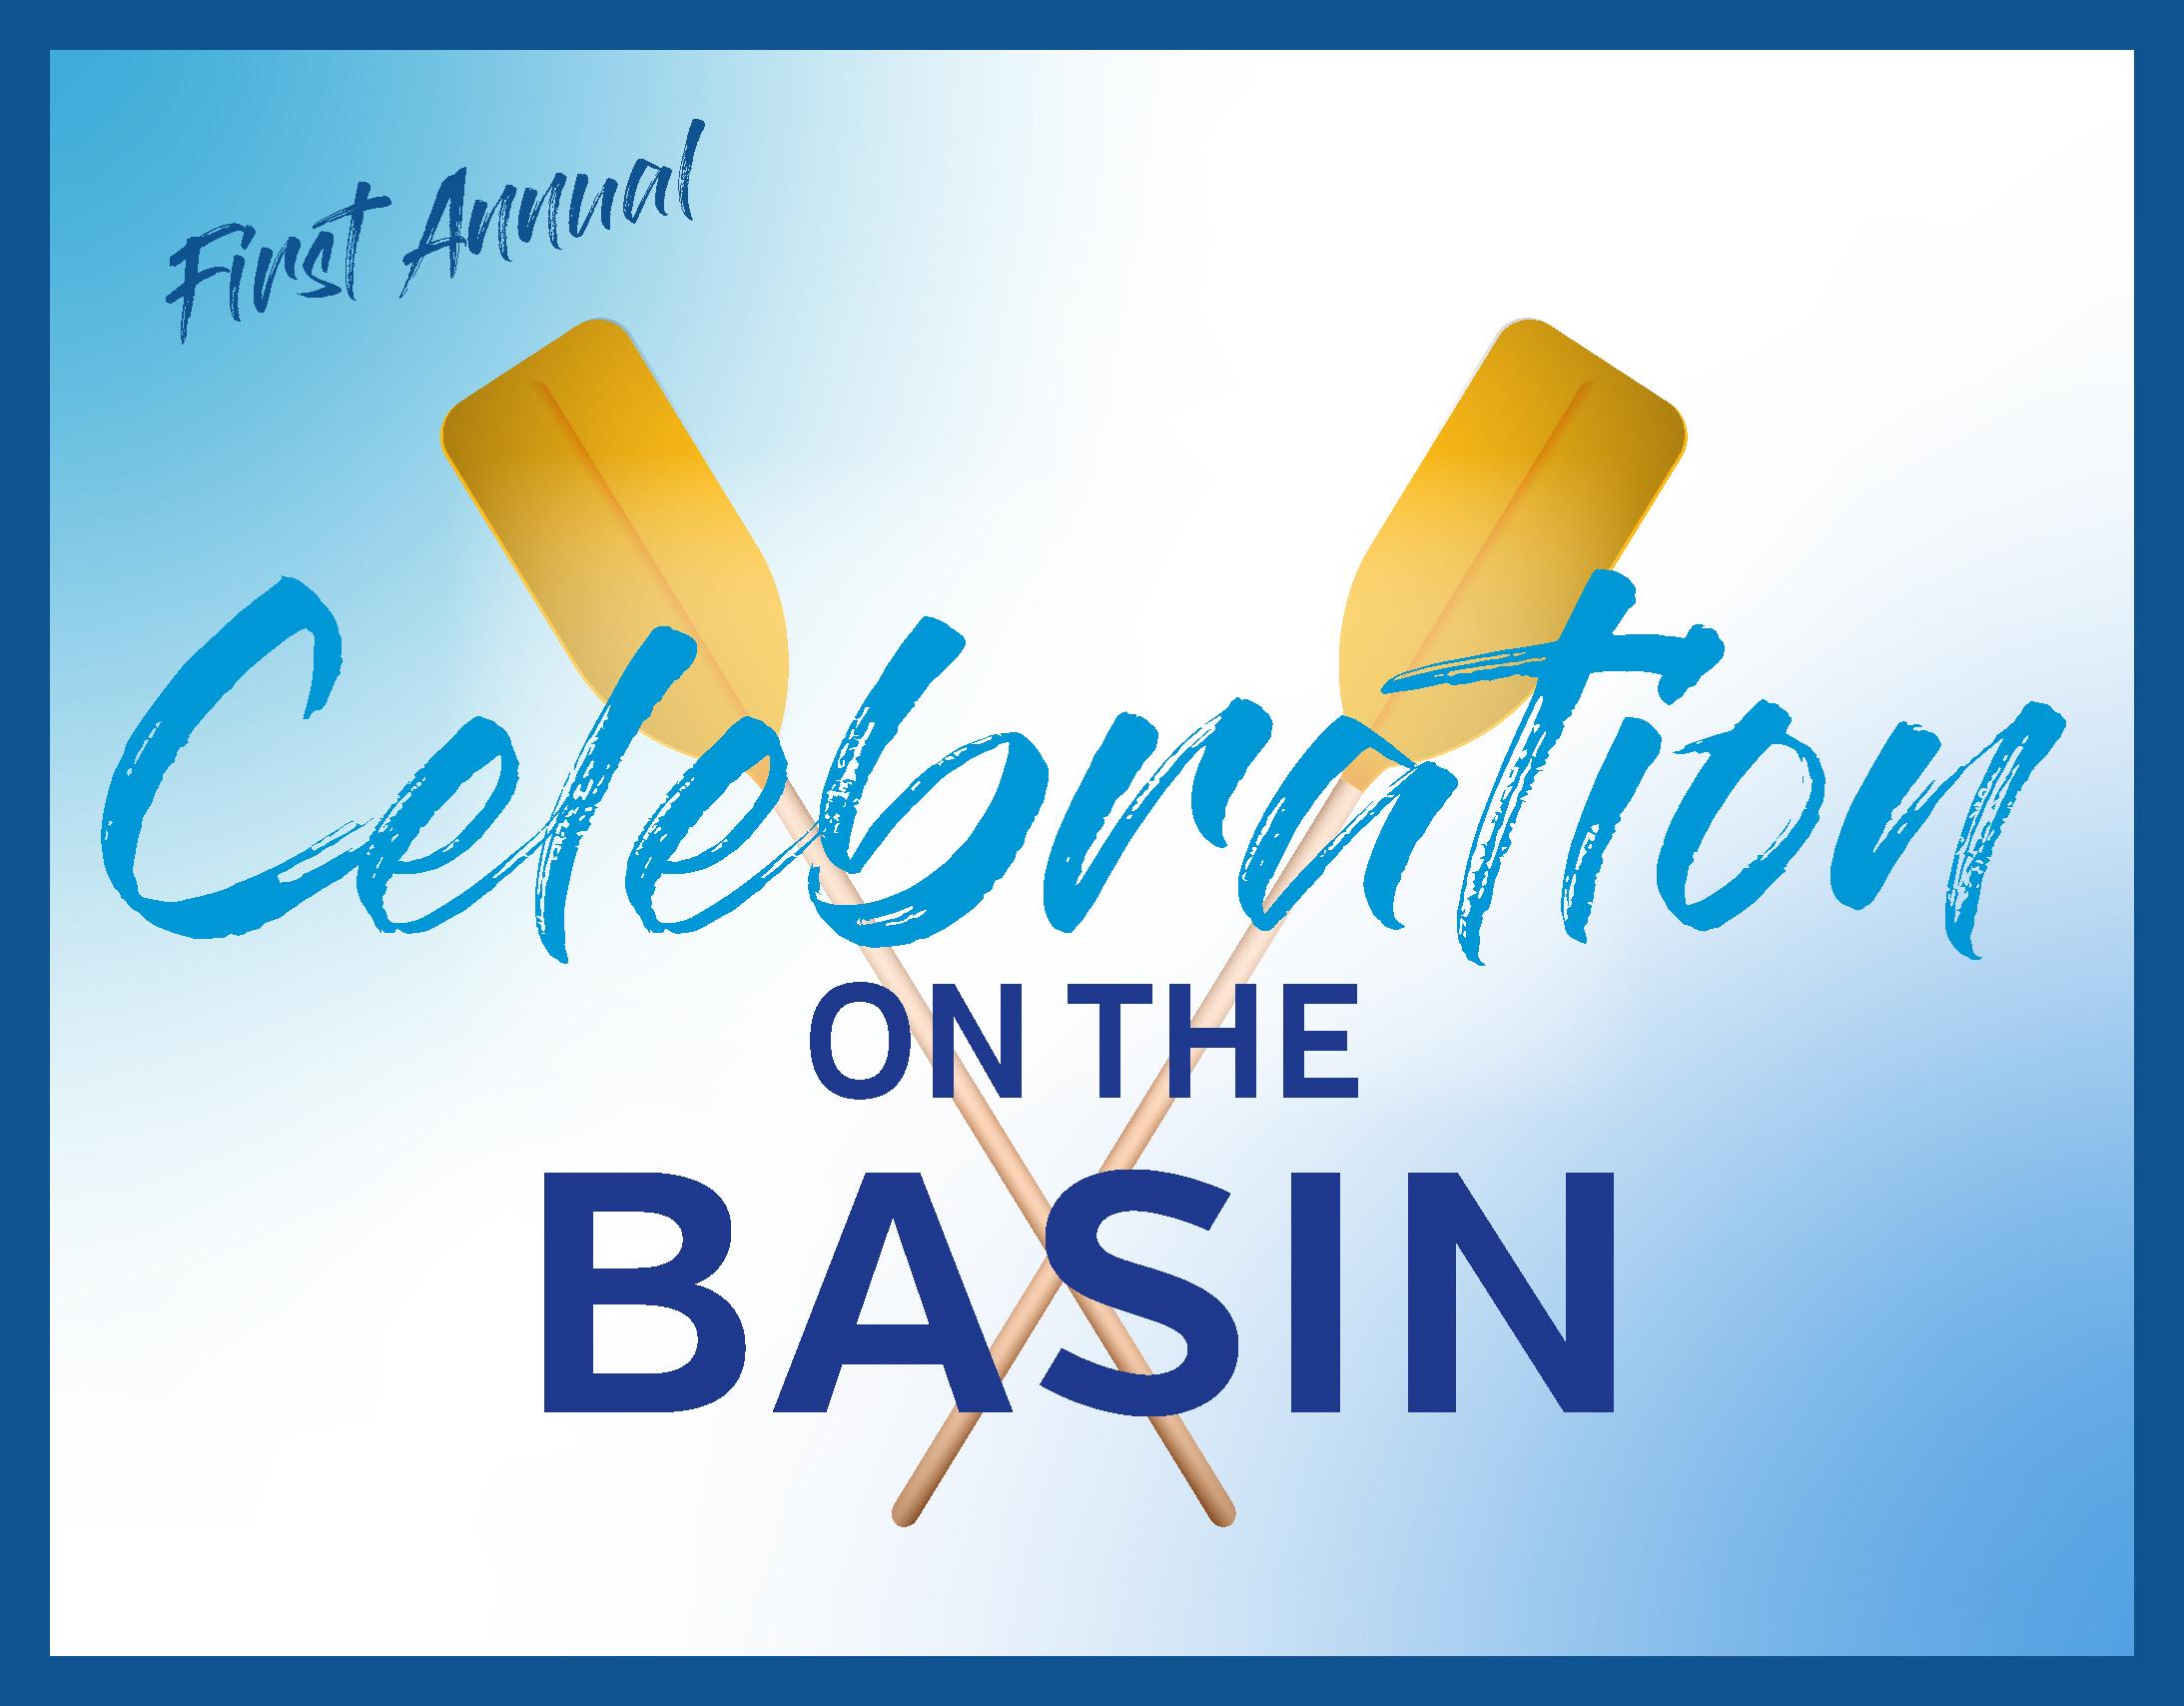 Celebration on the  Basin  Saturday 8/28/2021